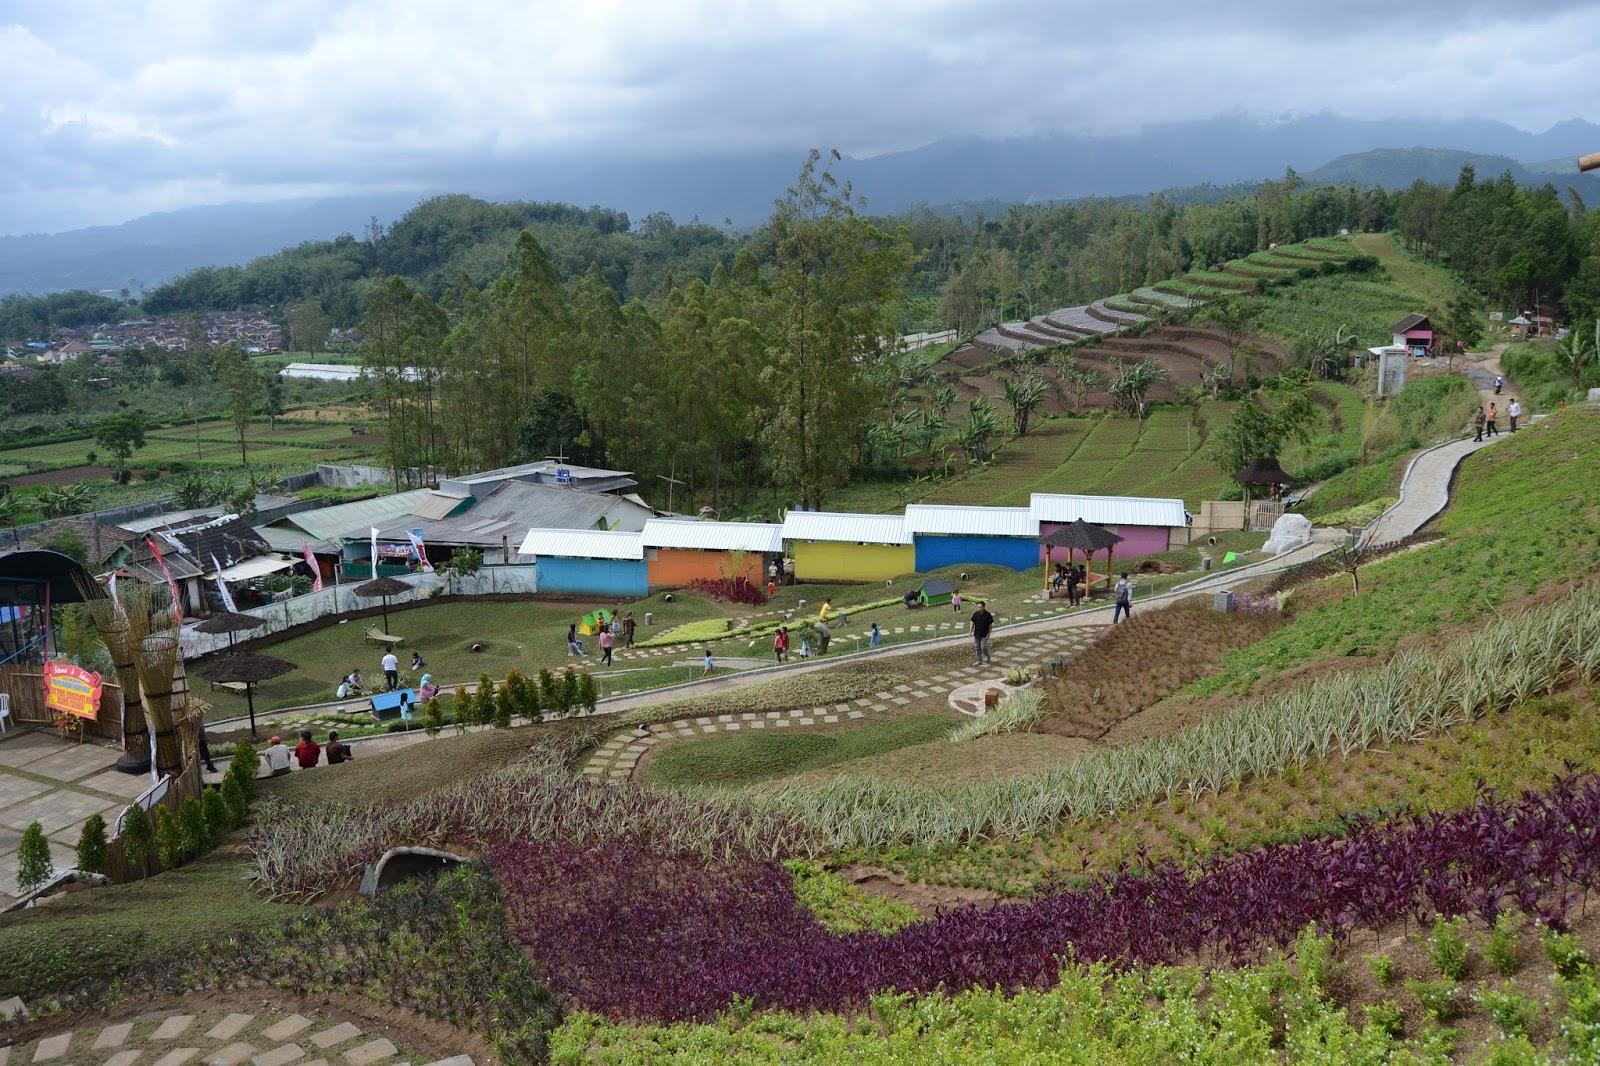 Taman Kelinci Serunya Berinteraksi Langsung Malang Jawa Timur Kab